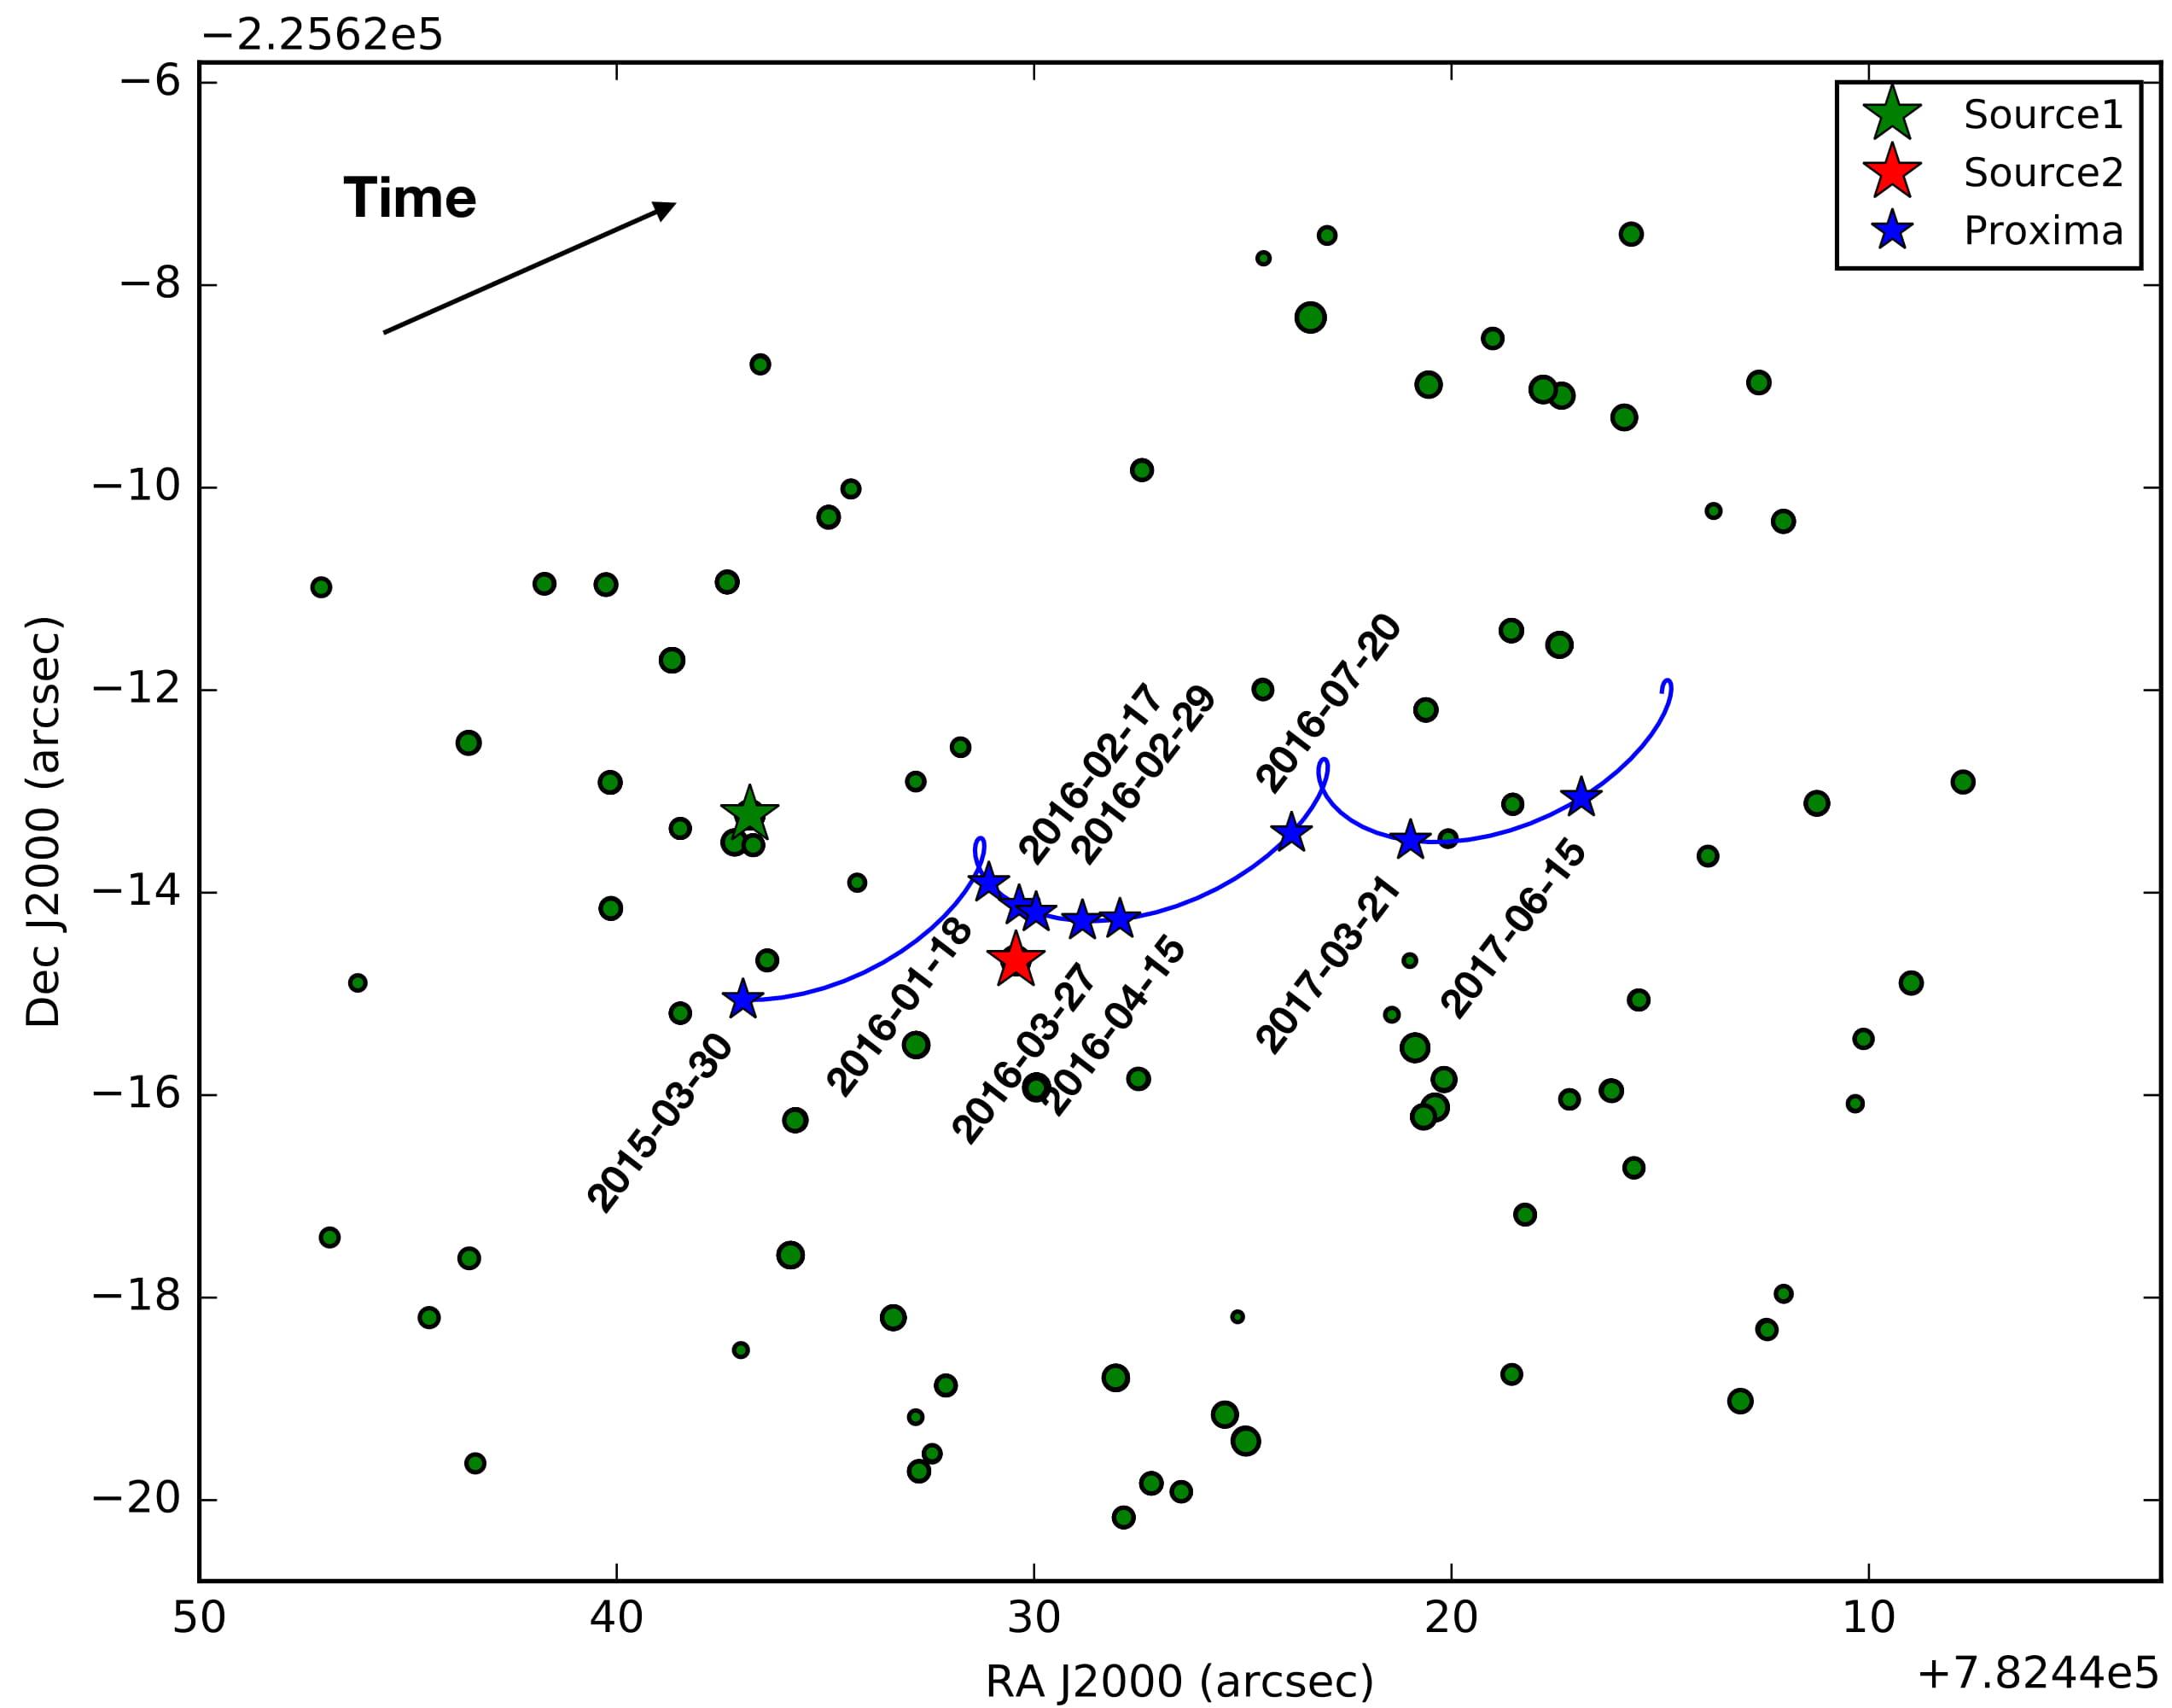 Próxima Centauri en la balanza de Einstein